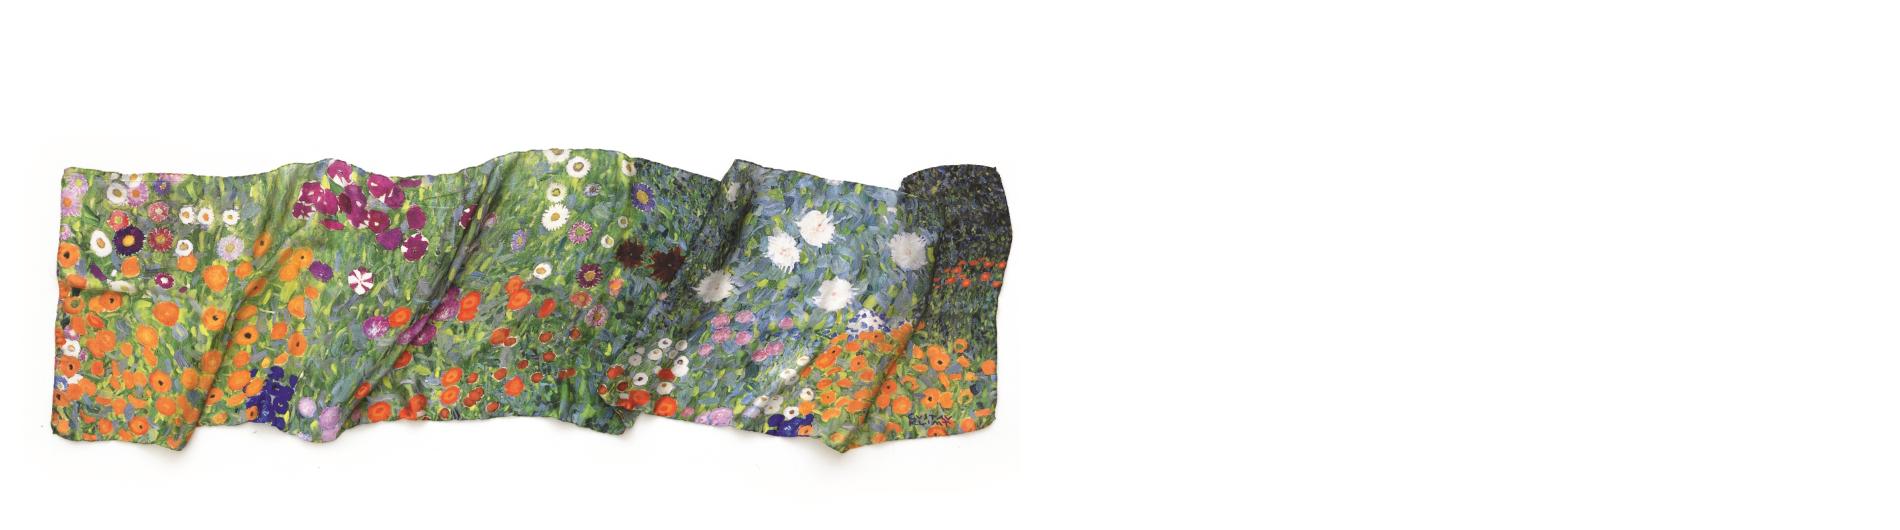 Gustav Klimt: Seidenschal